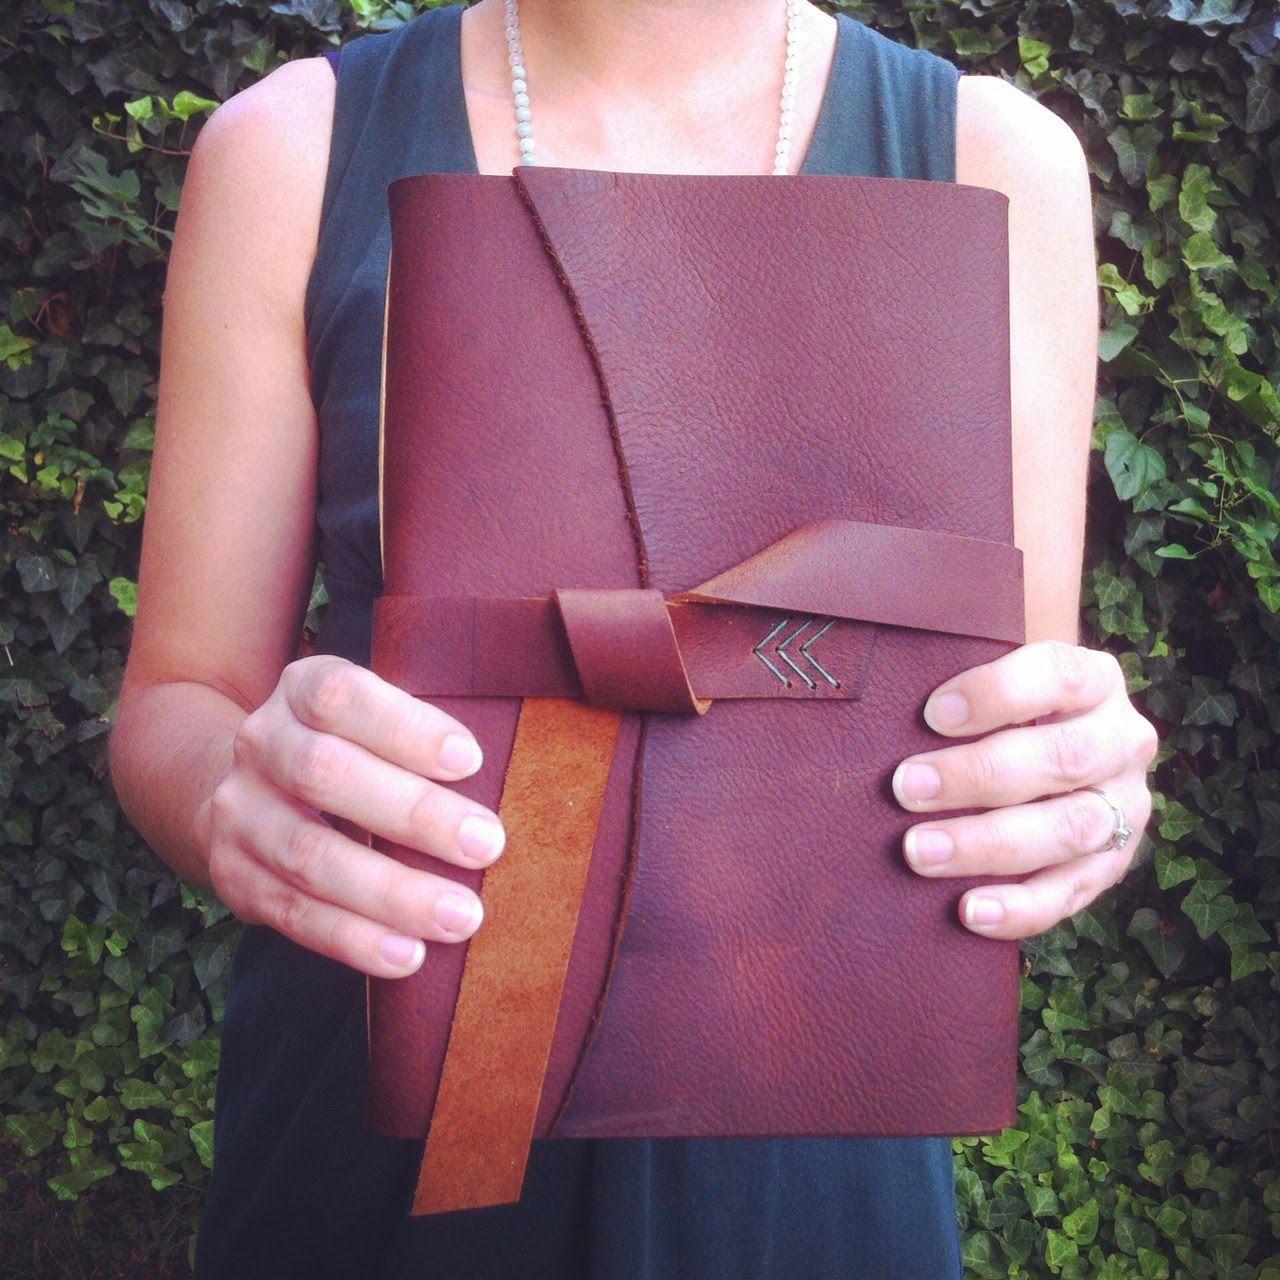 Handbound Leather Book Made By Katie Gonzalez Of Linenlaid